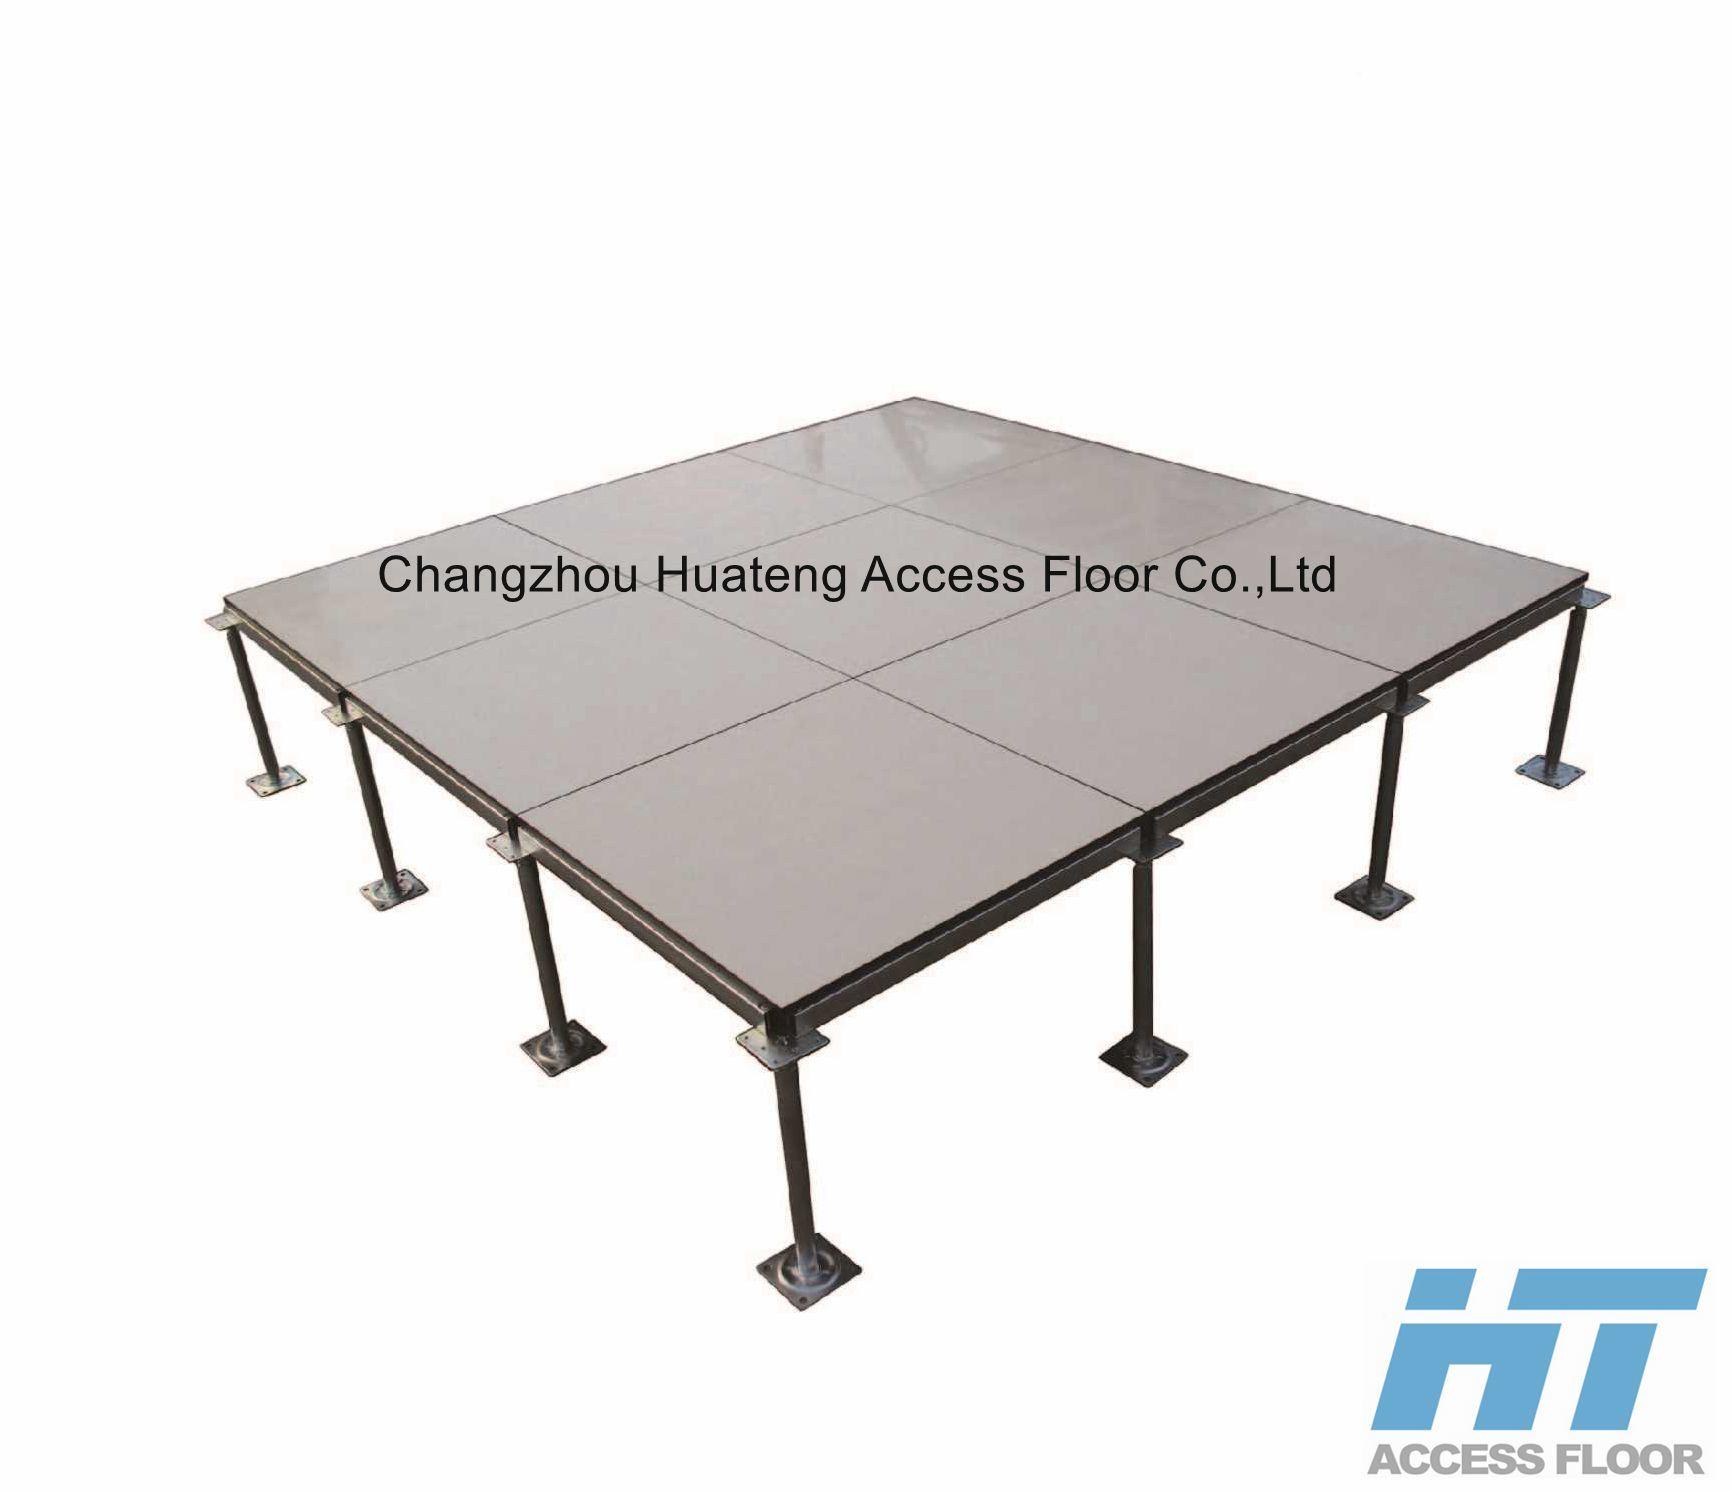 China Raised Floor, Access Floor, Anti Static Flooring Supplier   Changzhou  Huateng Access Floor Co., Ltd.